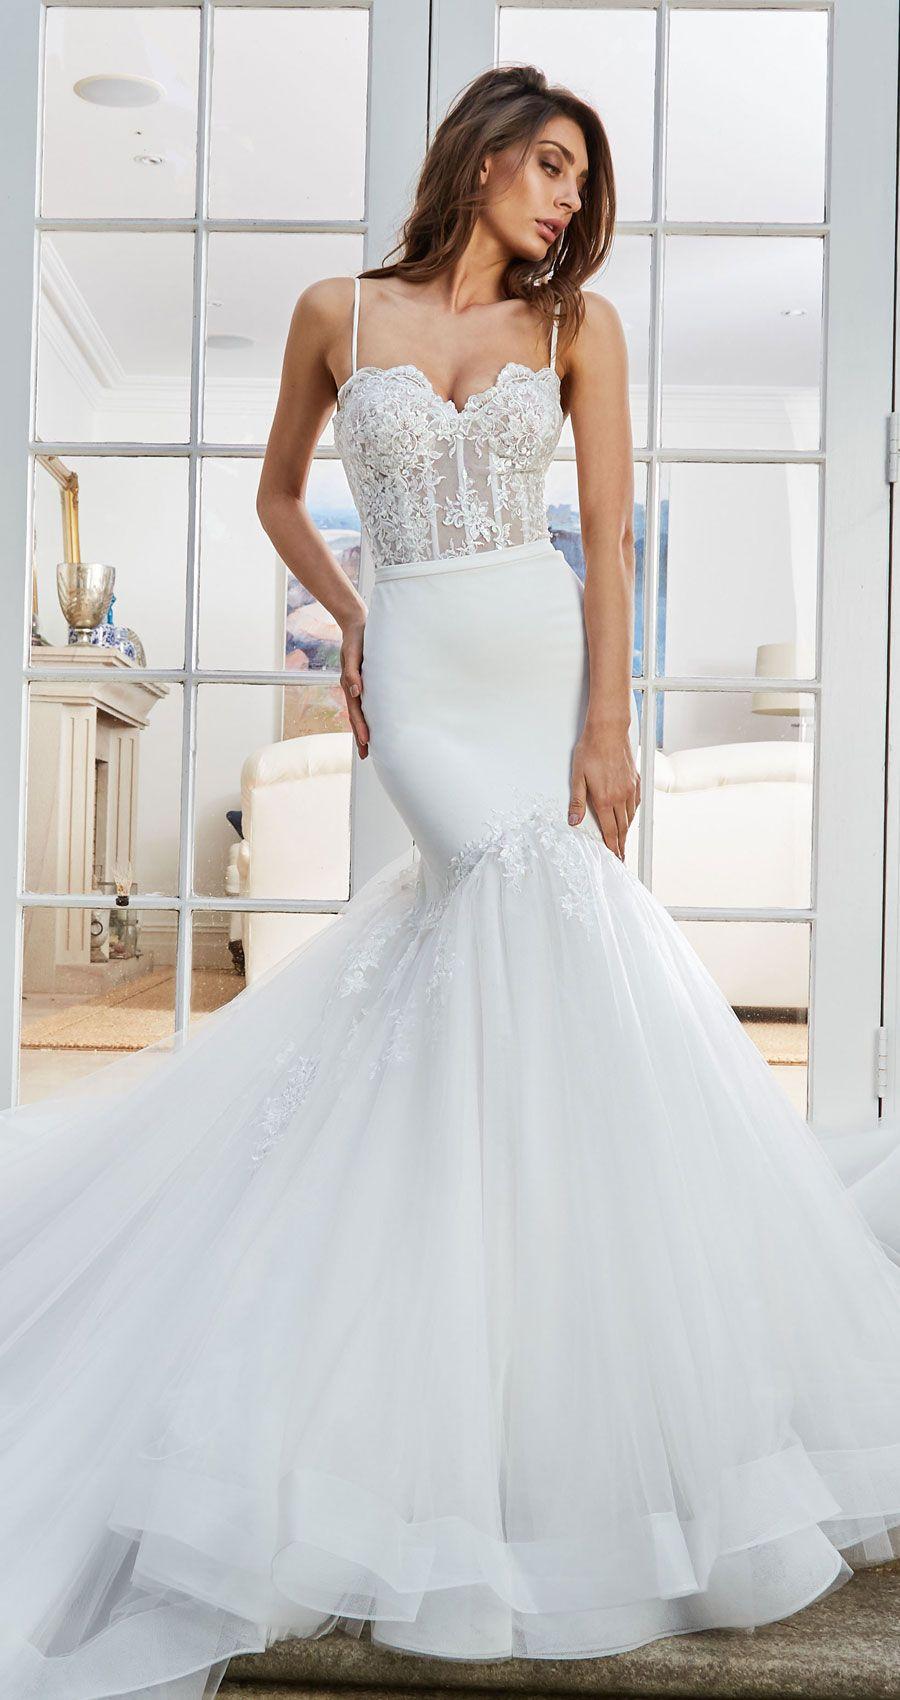 Leah Da Gloria Made To Order Wedding Gowns - I Take You | Wedding ...